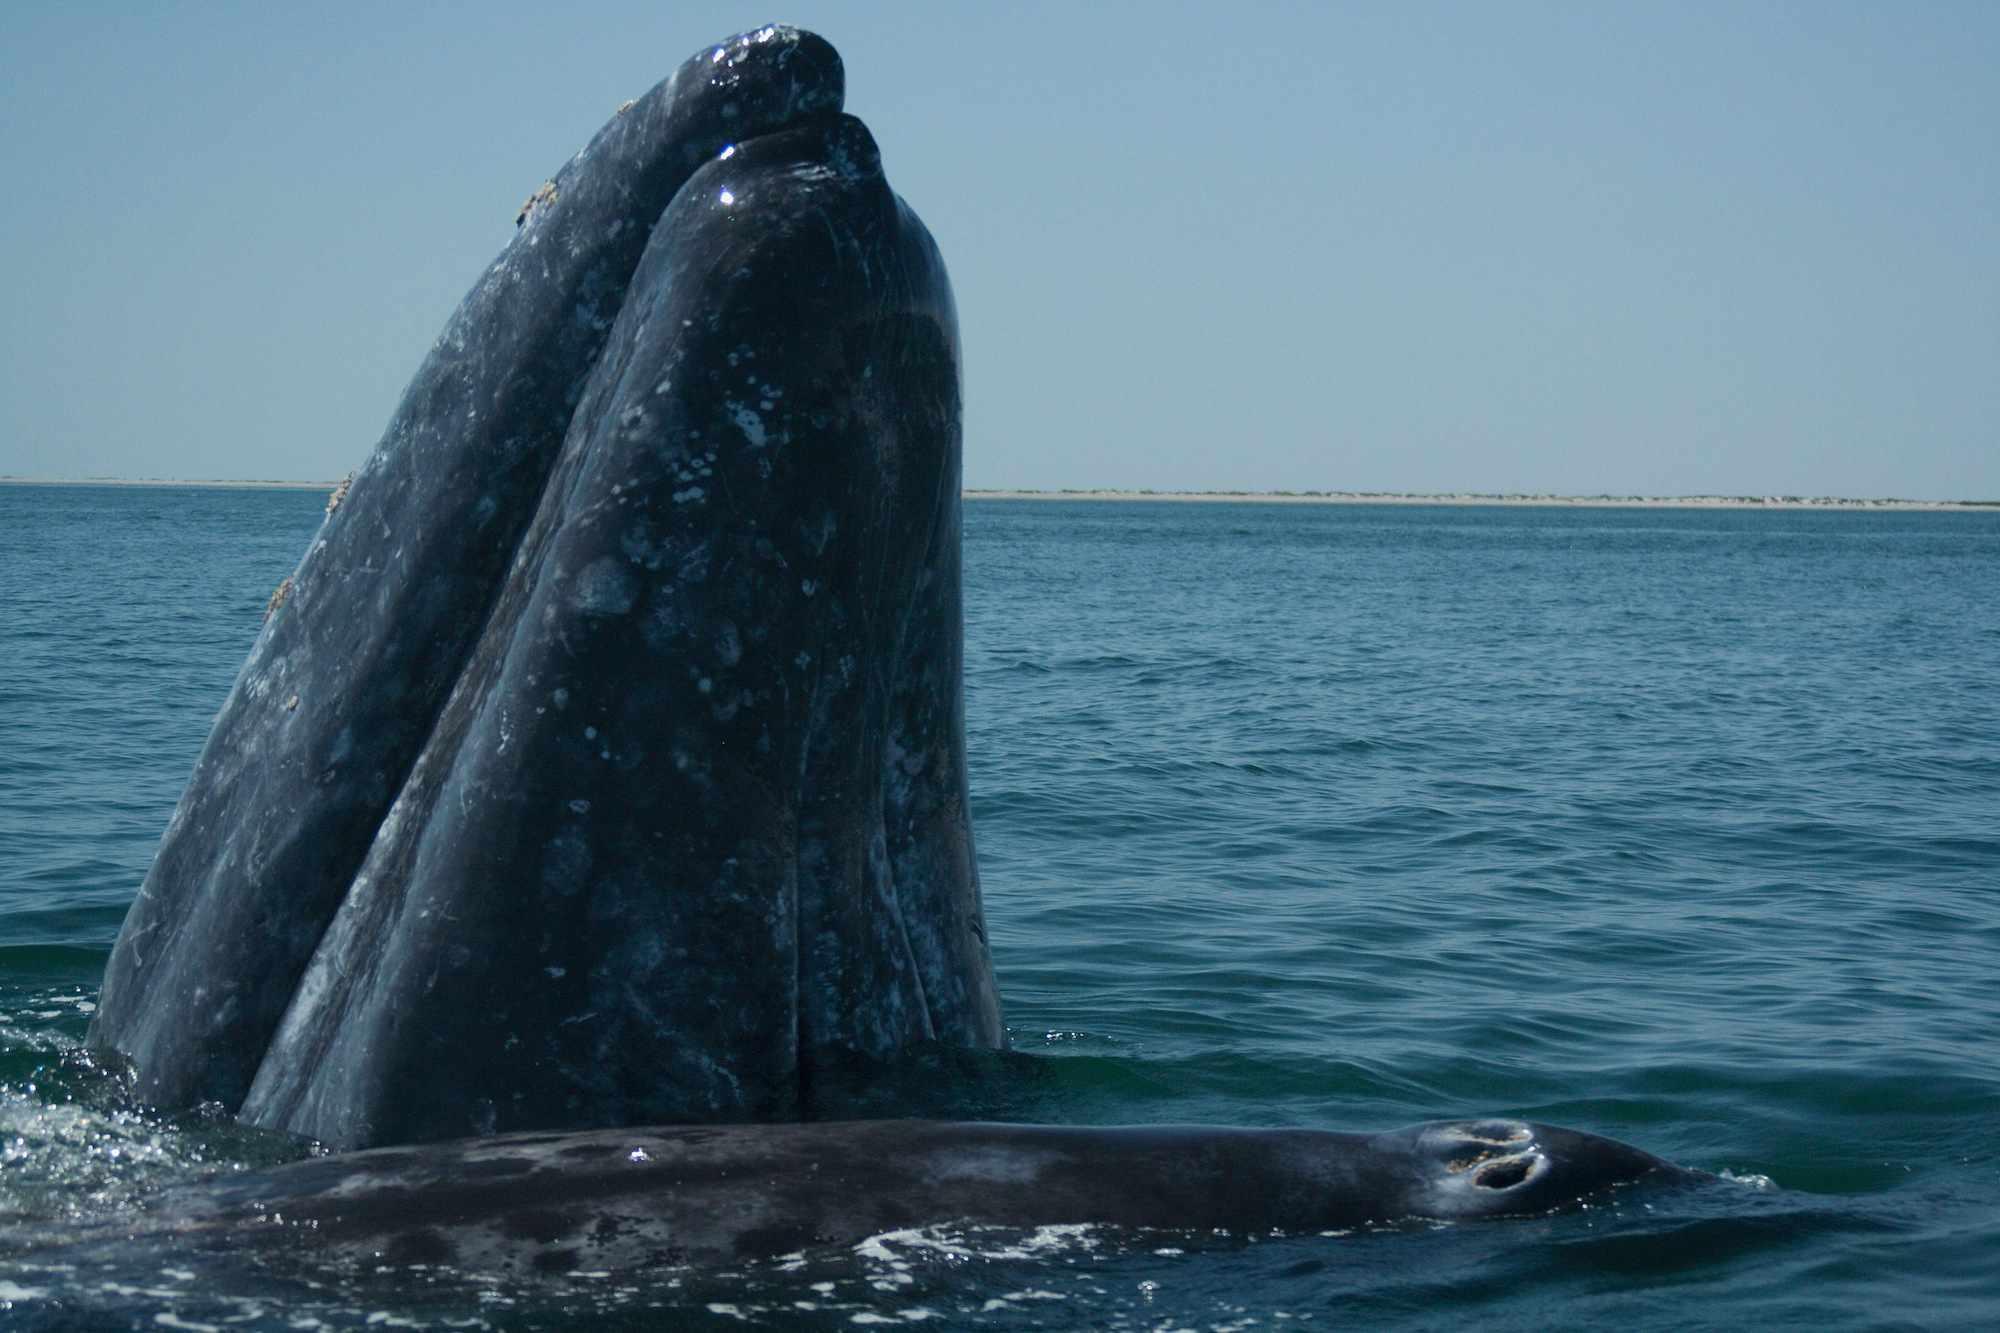 Una ballena gris adulta y su cría se acercan a los turistas. / An adult gray whale and its calf approach tourists.